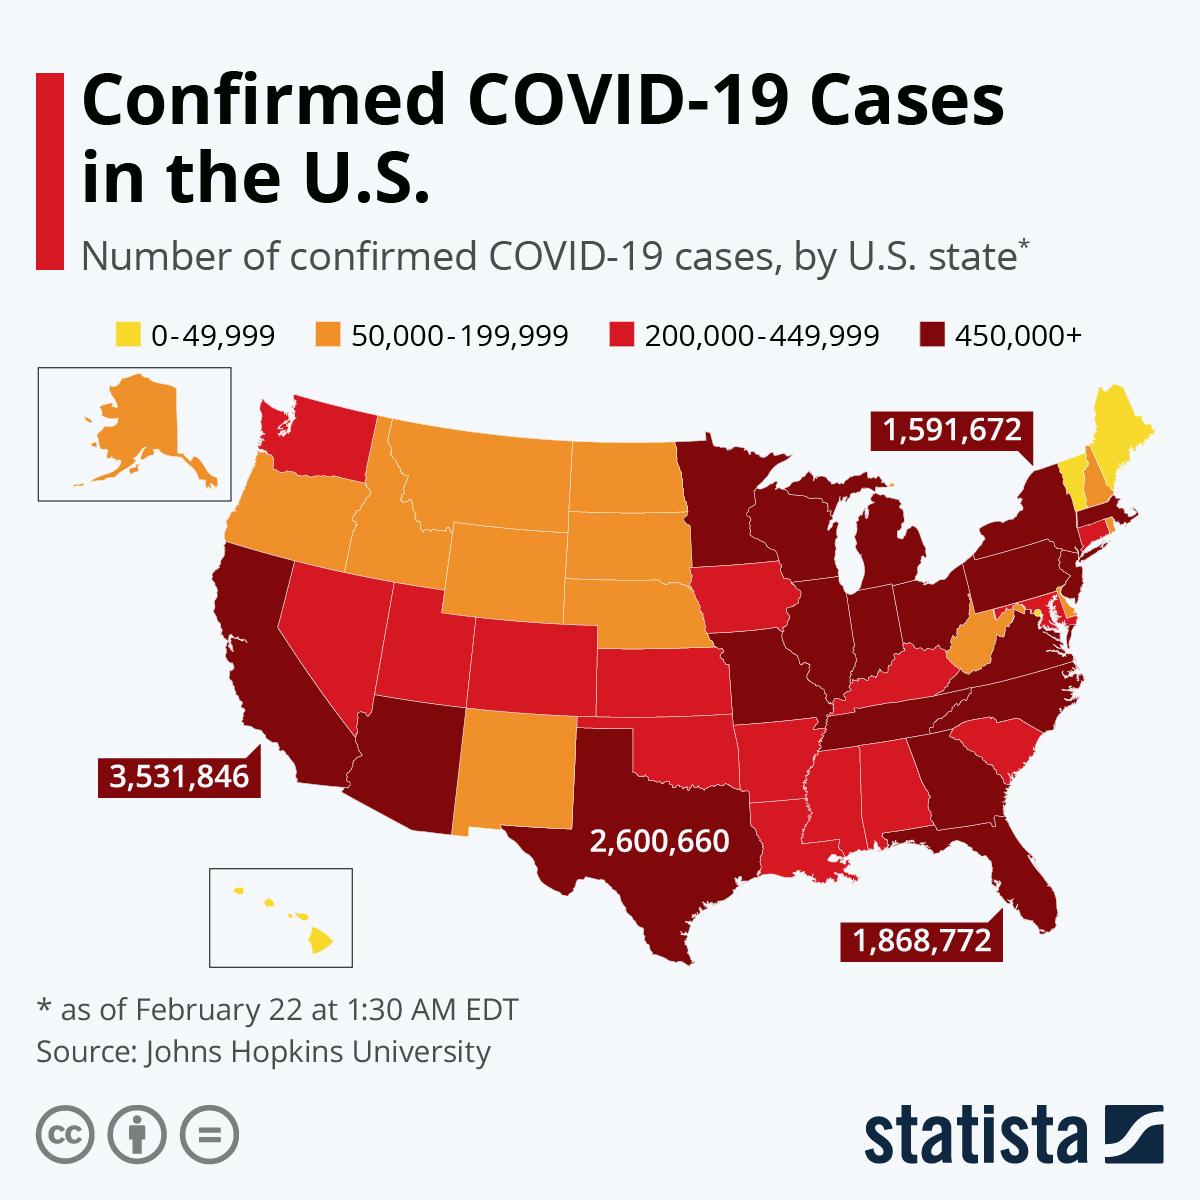 U.S COVID-19 Map